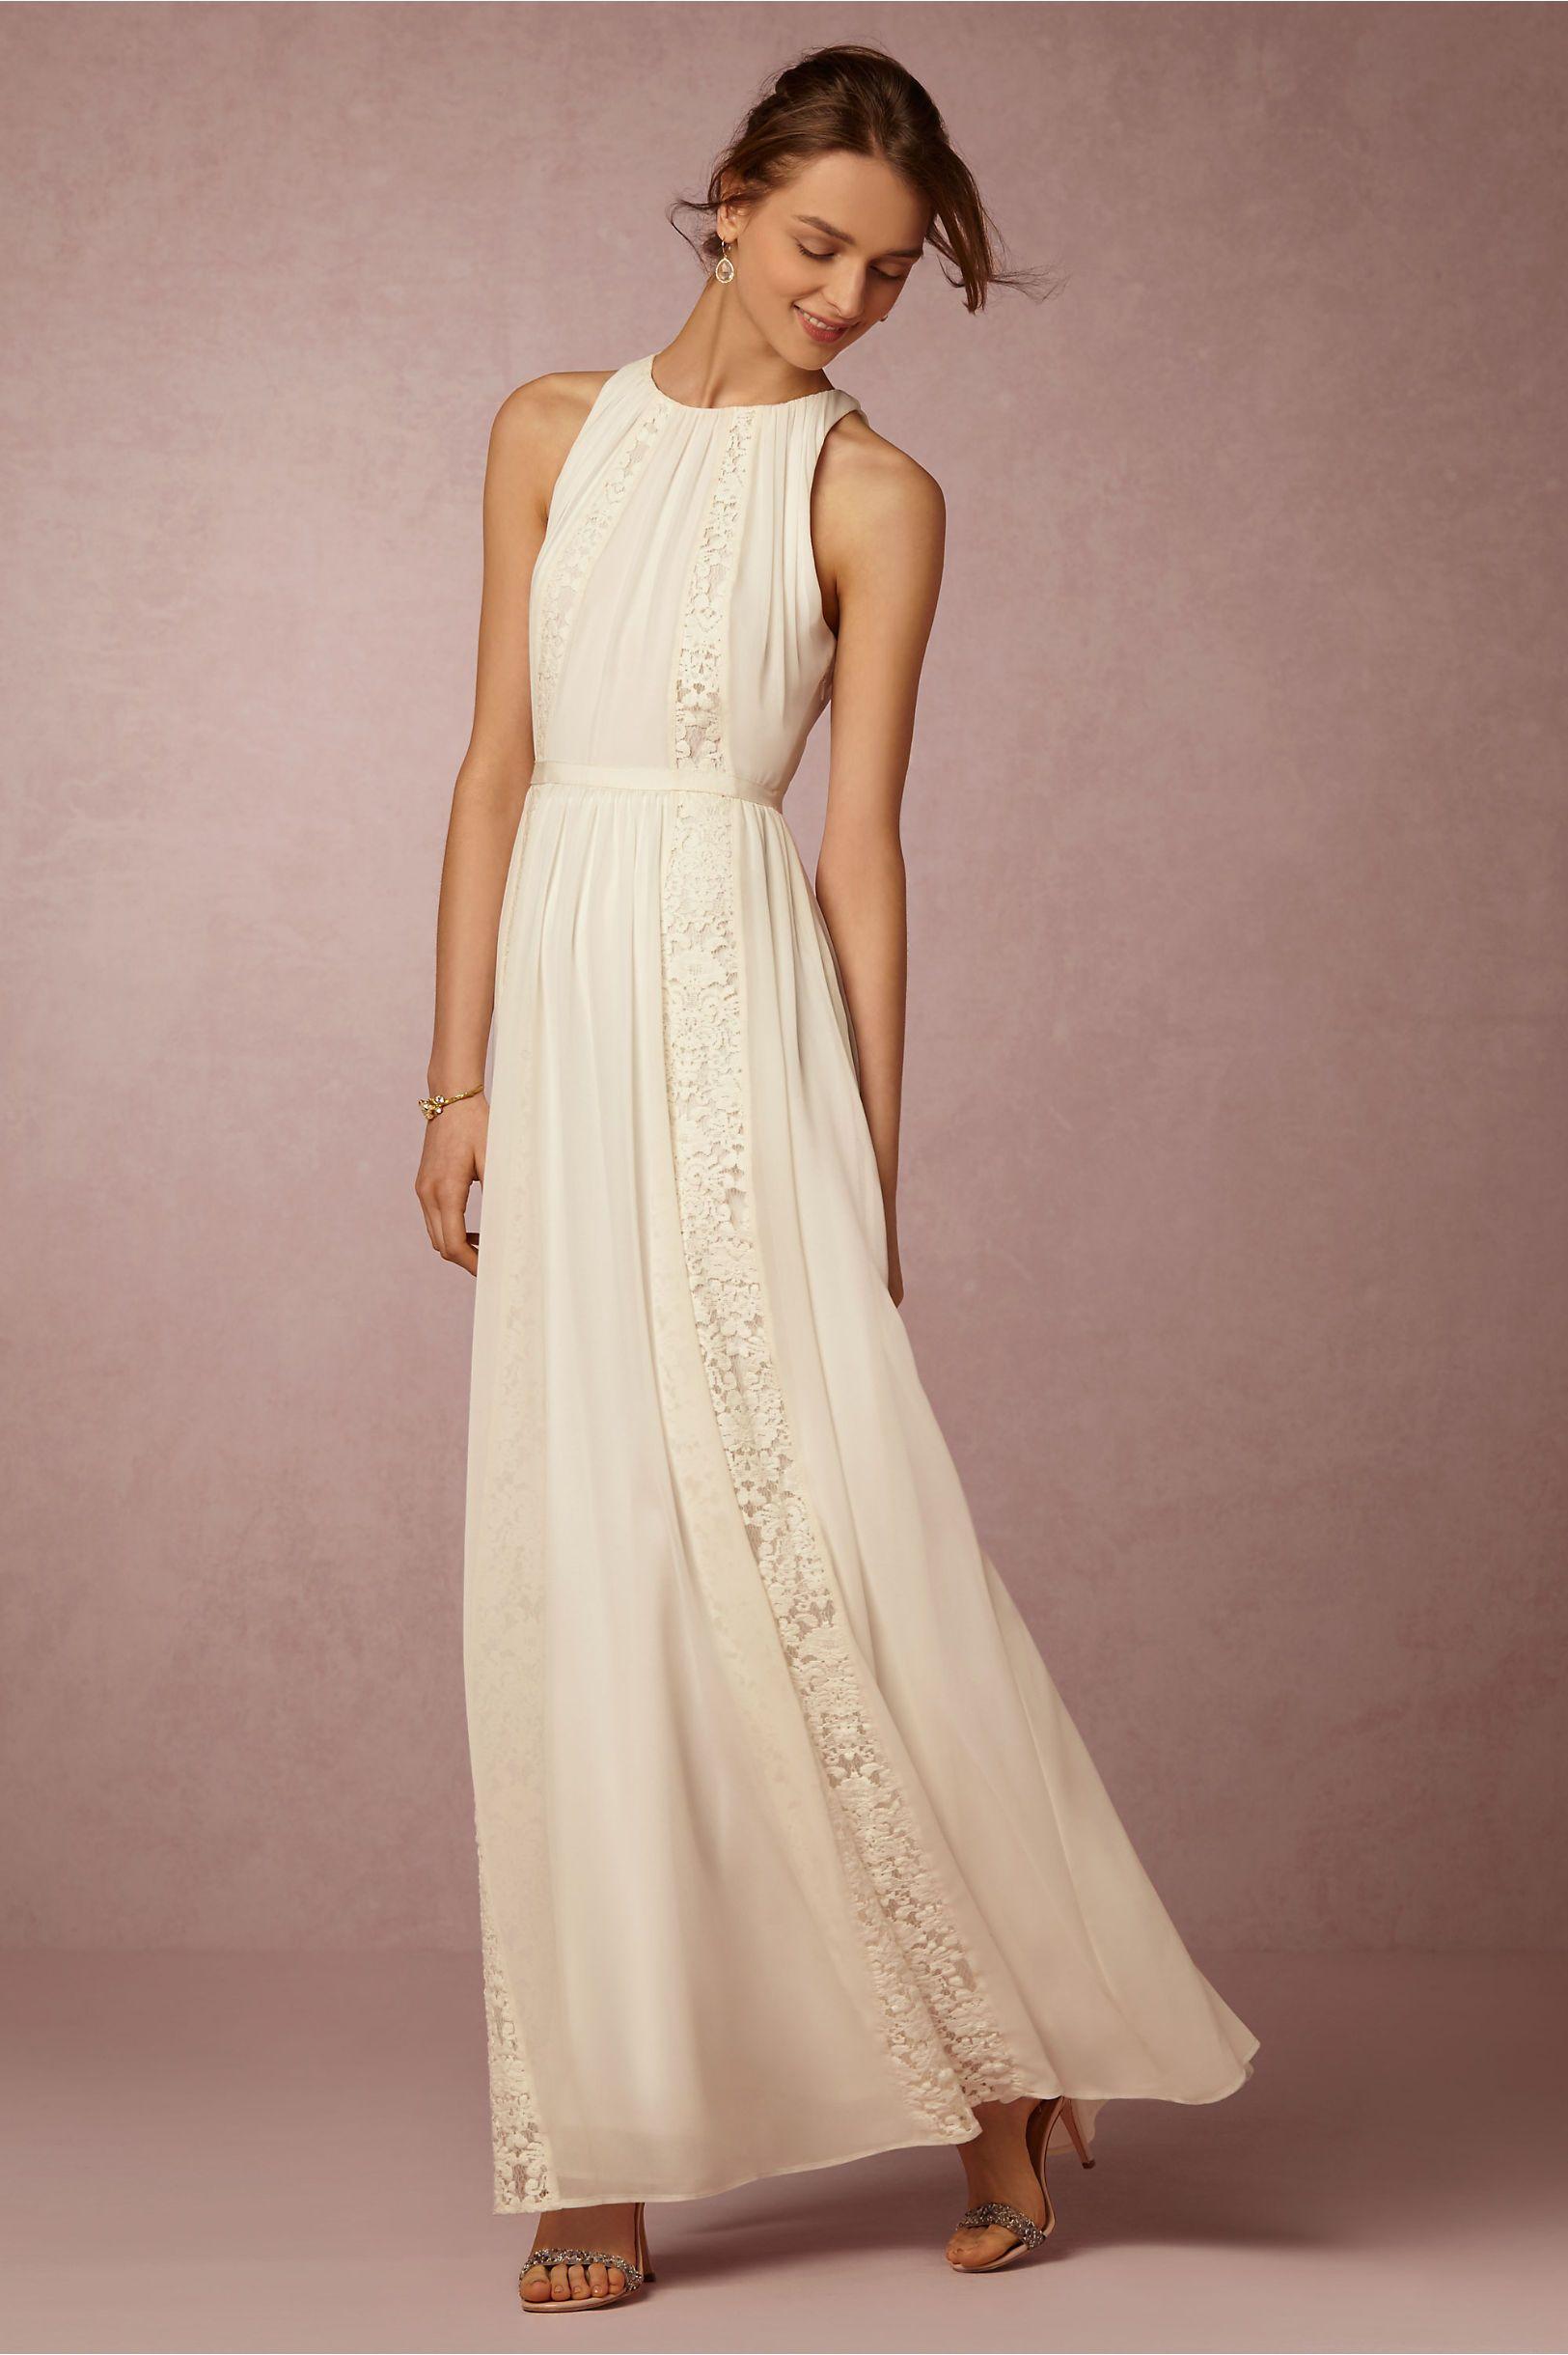 beach dresses for weddings BHLDN Chandler Dress in Dresses View All Dresses at BHLDN